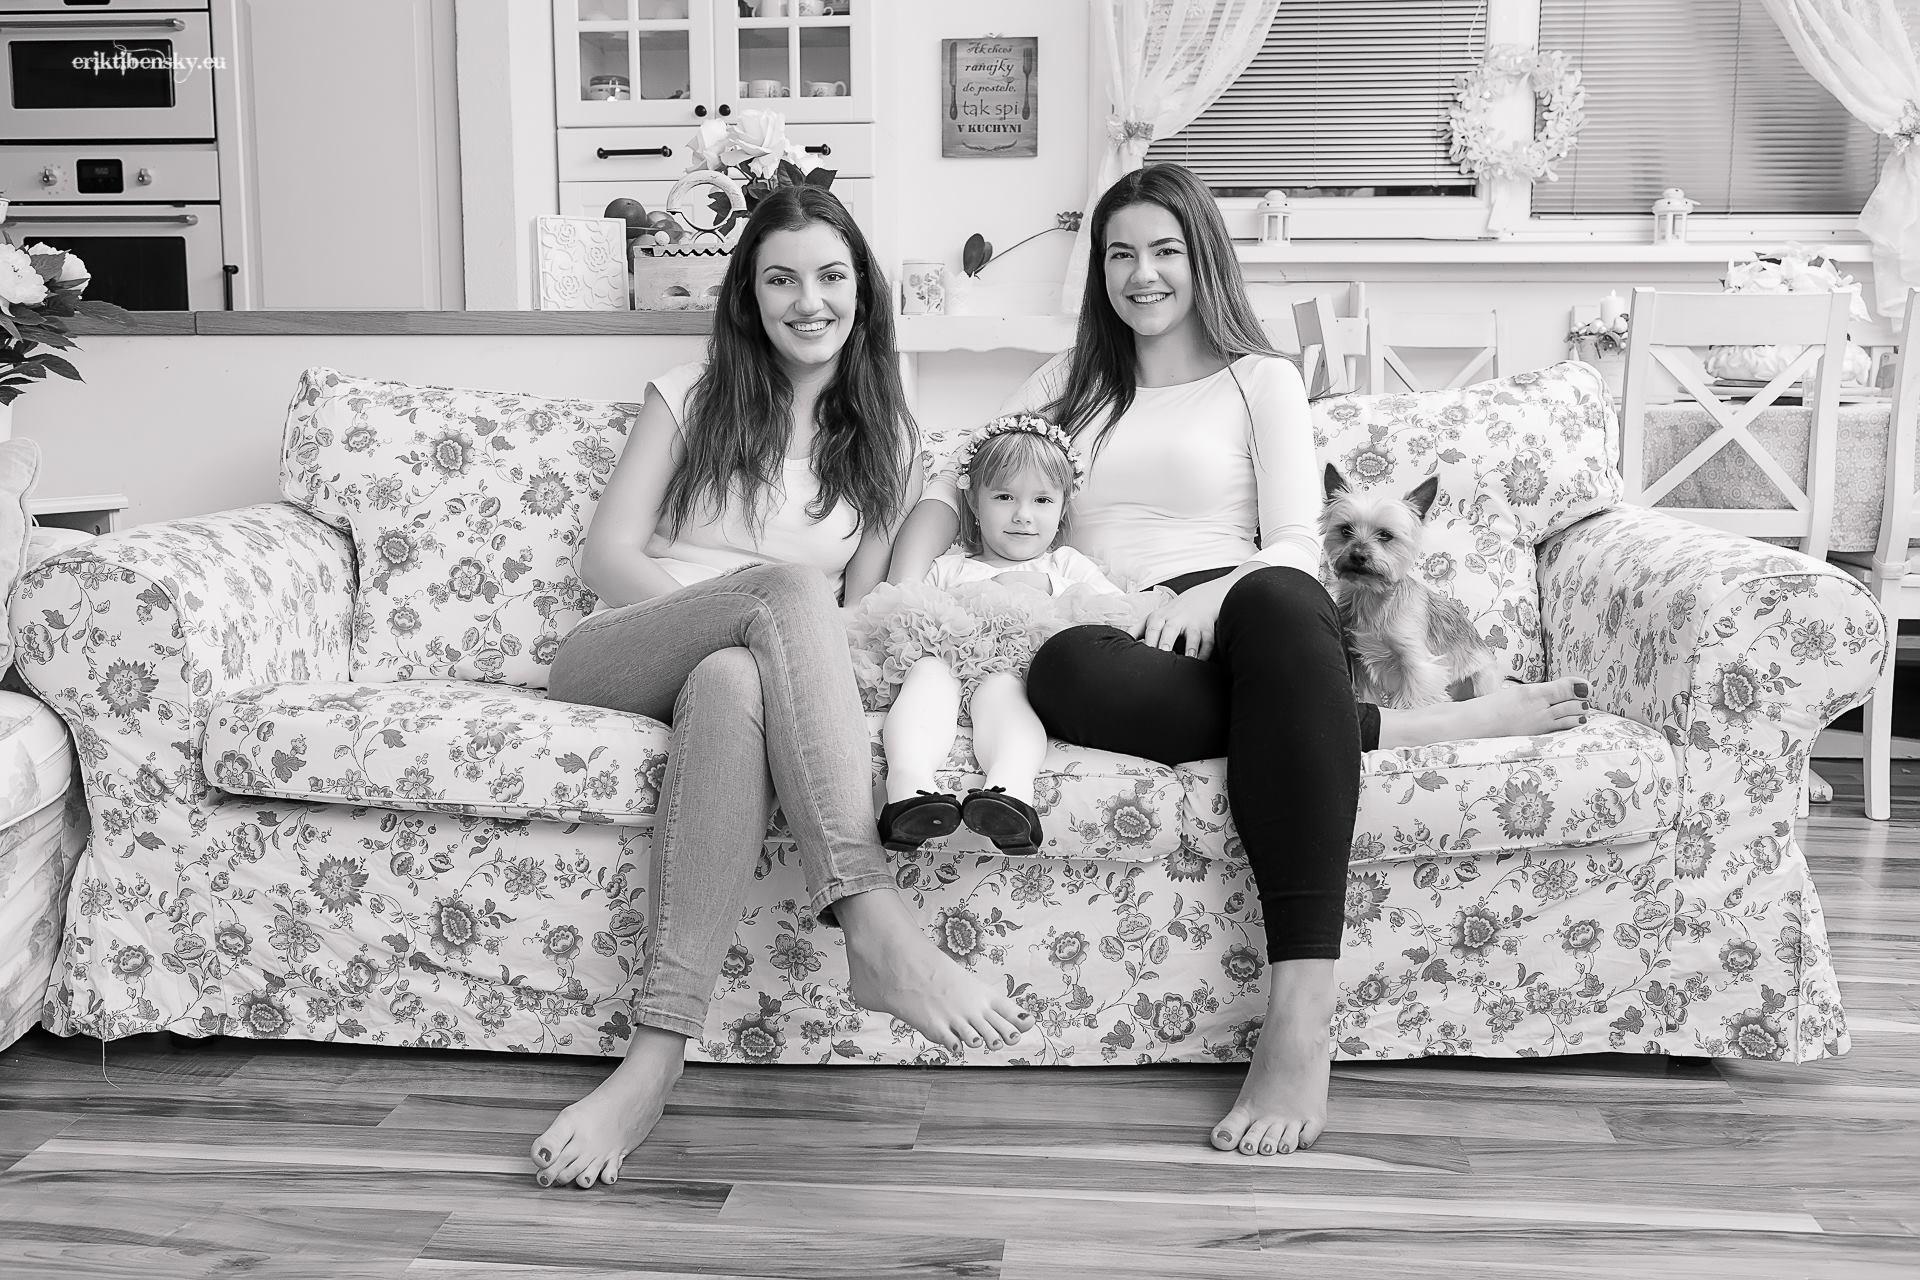 eriktibensky-eu-fotograf-home-photo-family-rodina-kids-deti-1008